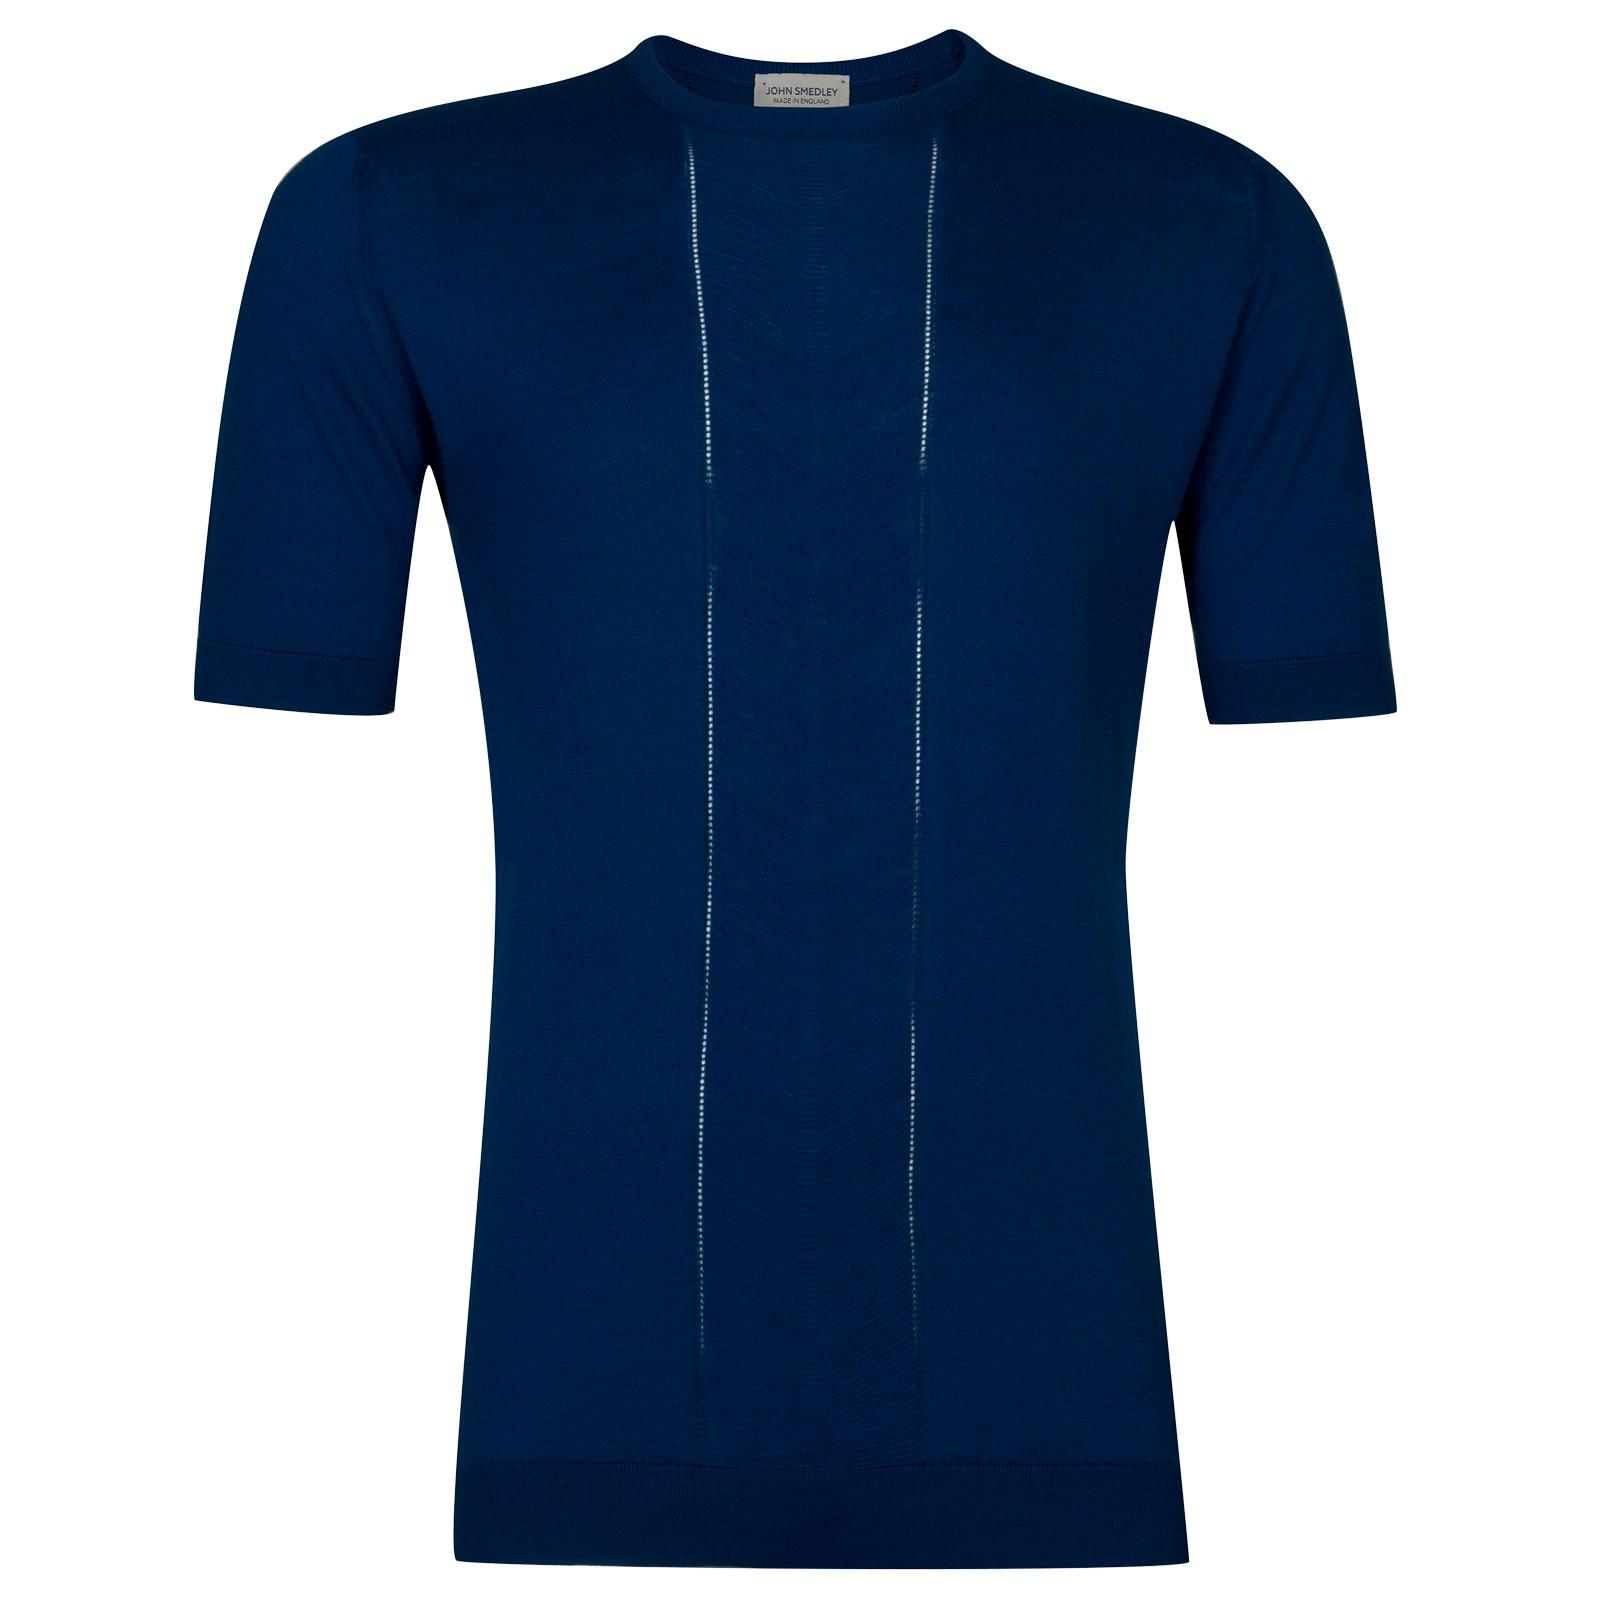 taber-stevens-blue-L